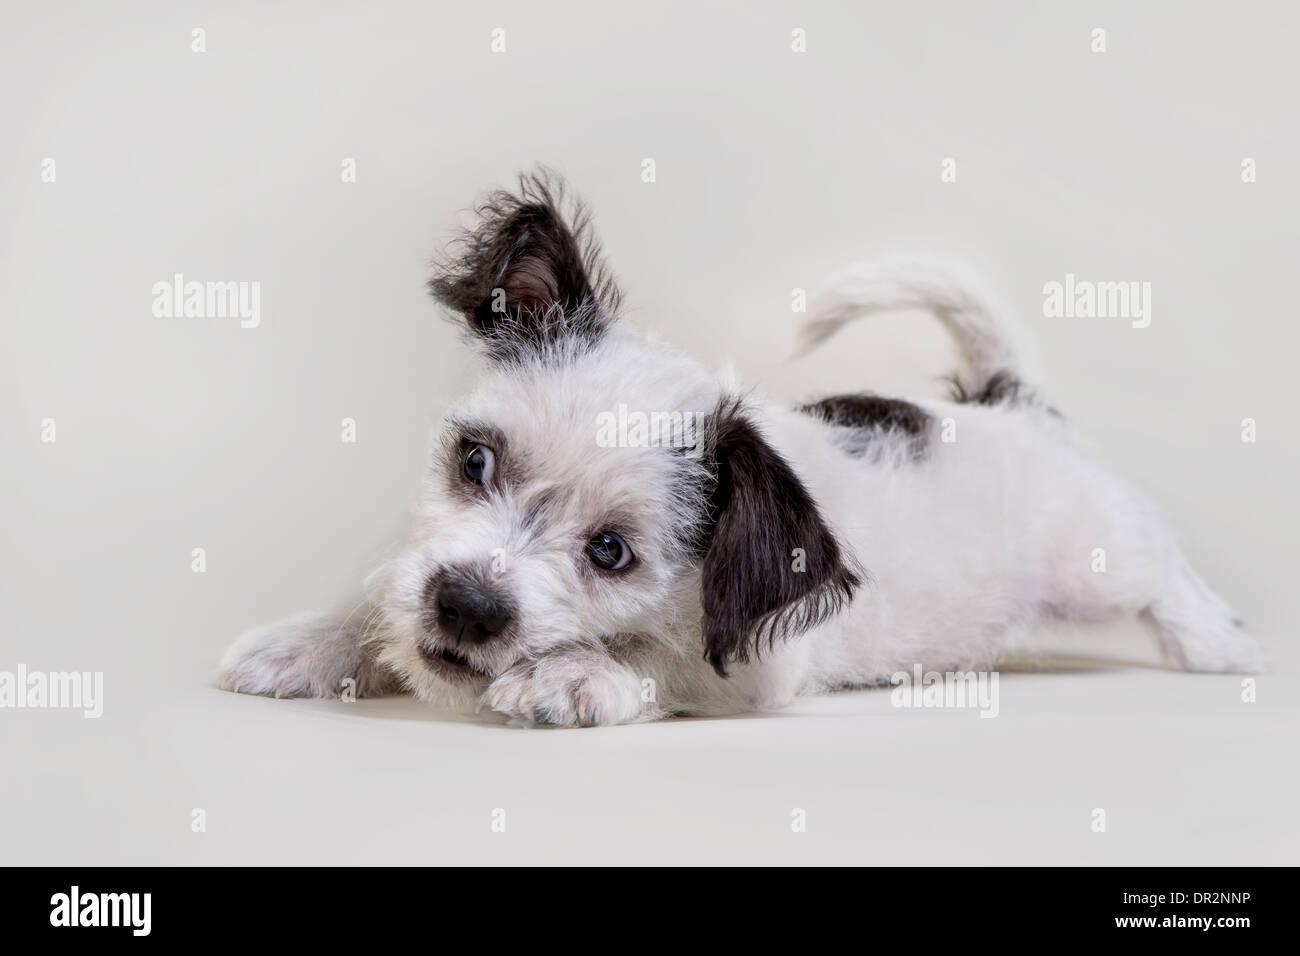 Terrier cachorros juguetones en gris claro studio como telón de fondo. Imagen De Stock